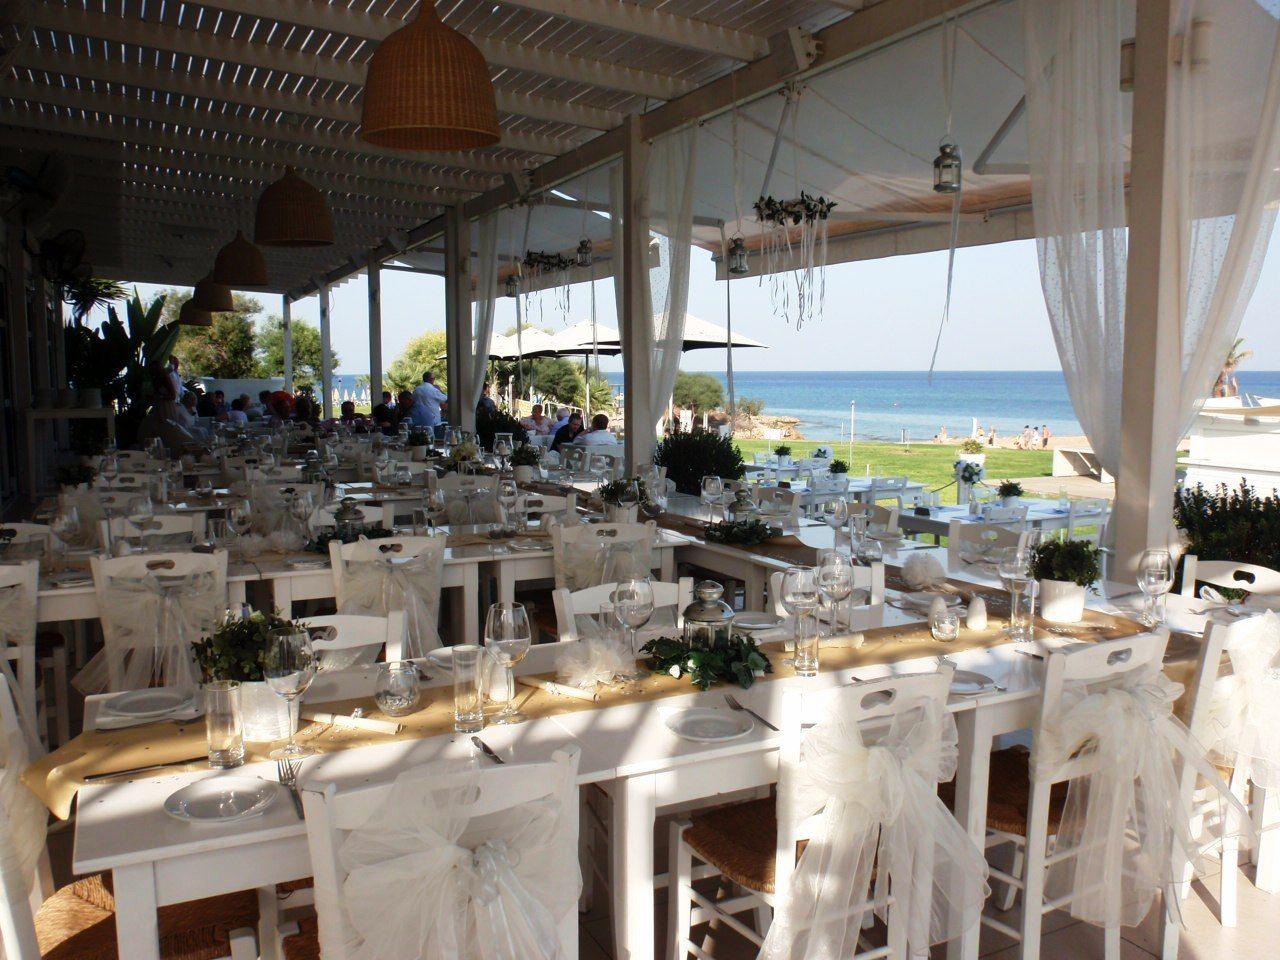 Wedding decor images  Alati Restaurant  Aphrodite Wedding Decor  Alati Restaurant